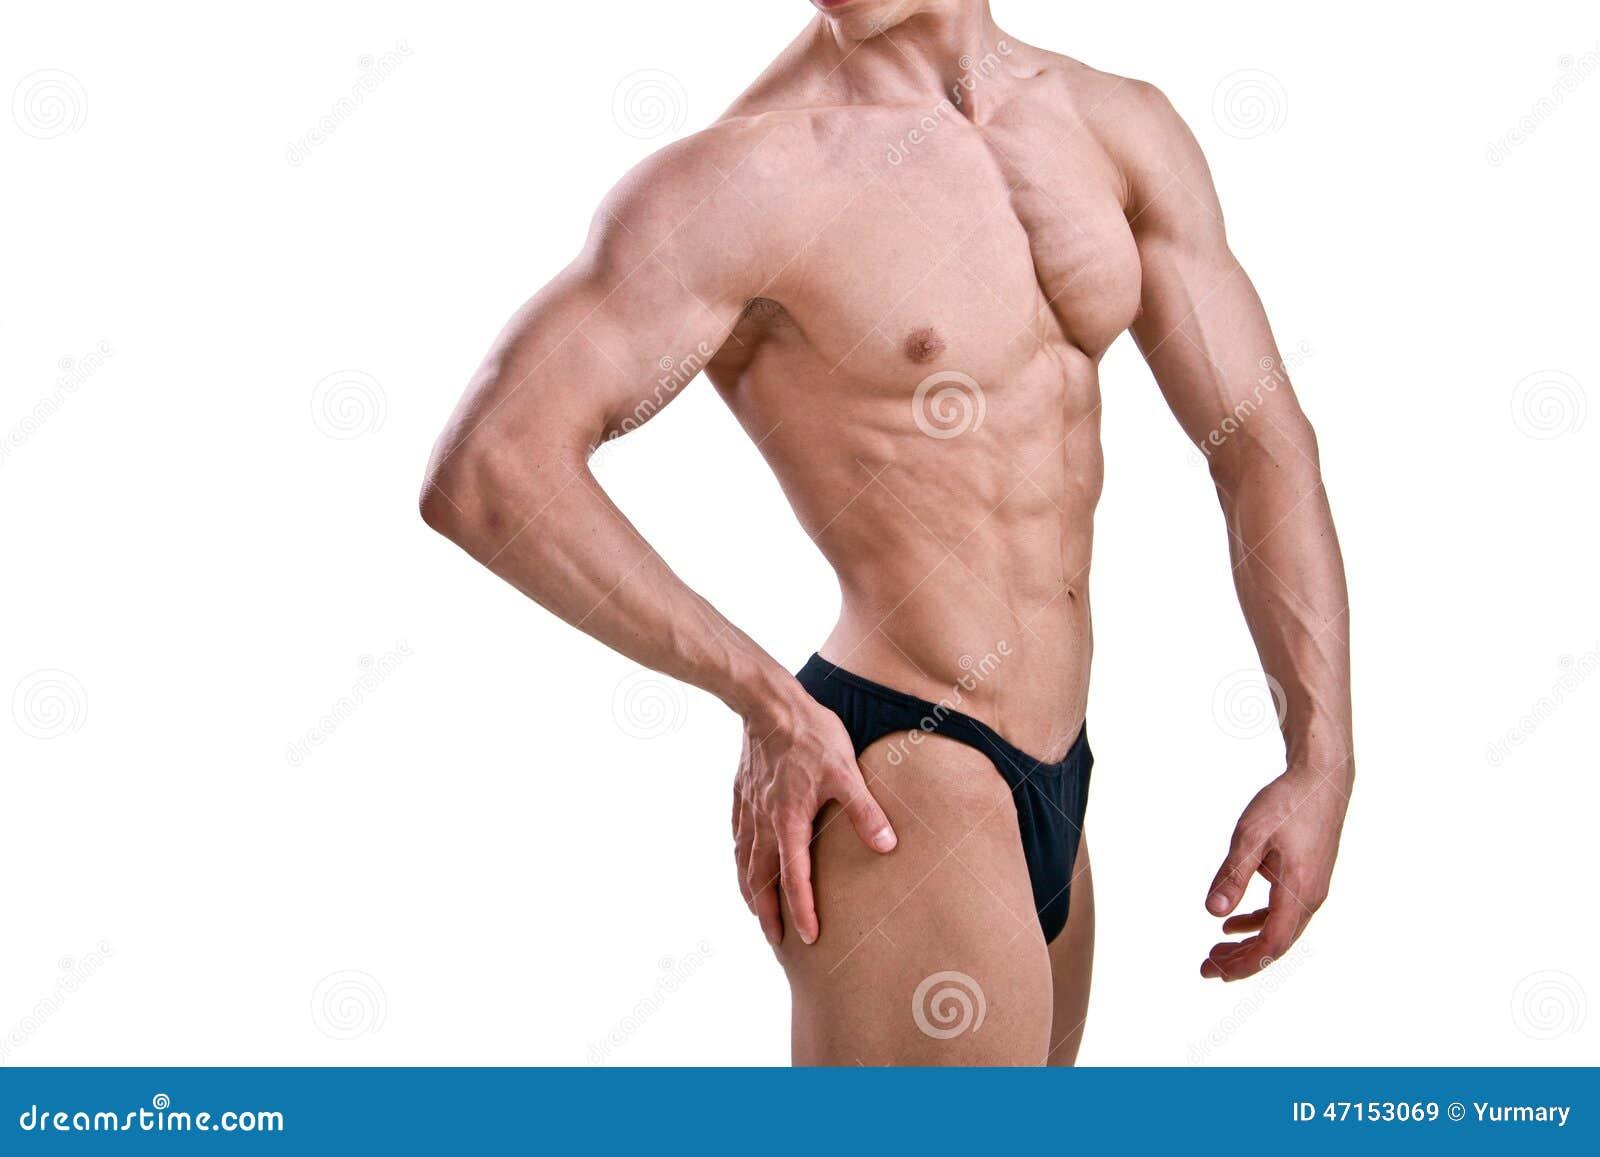 Splendid body! Athlete male naked pic Maja....a lepo